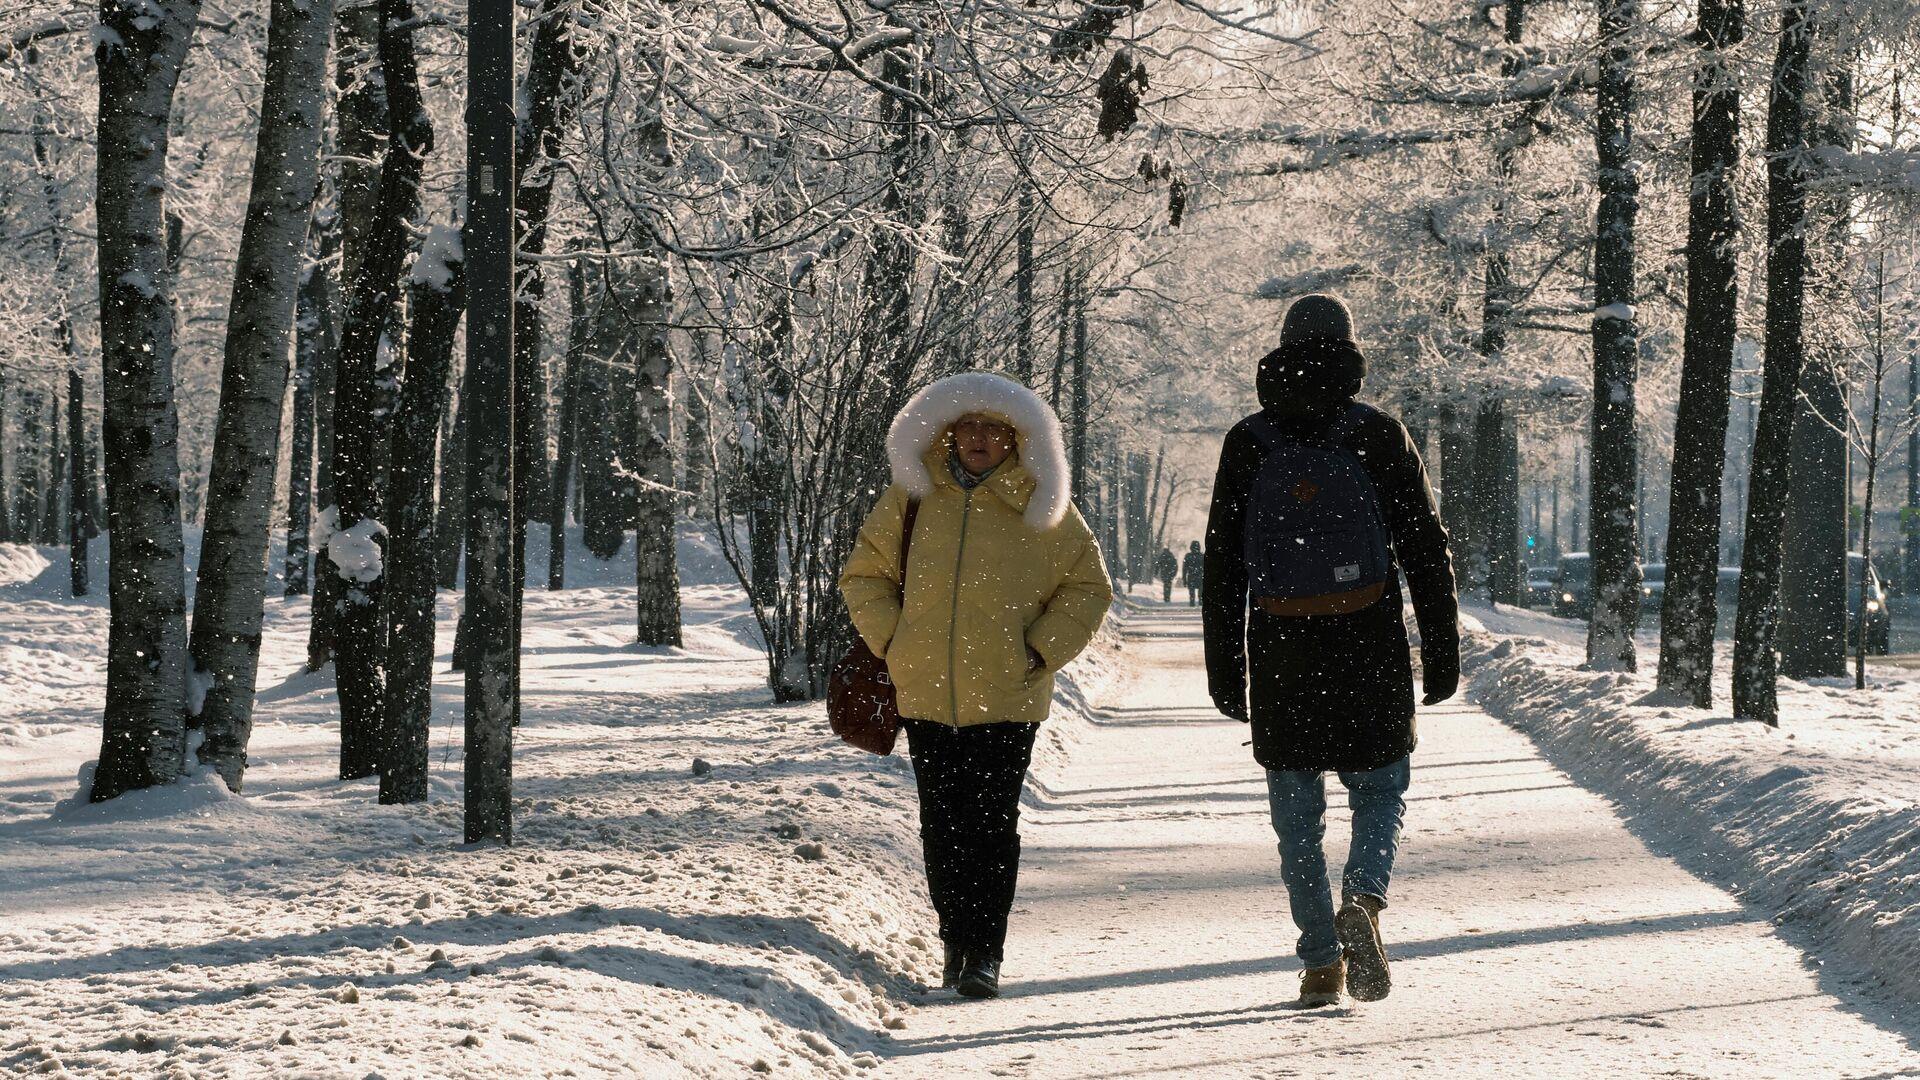 Зима в Санкт-Петербурге - РИА Новости, 1920, 09.03.2021